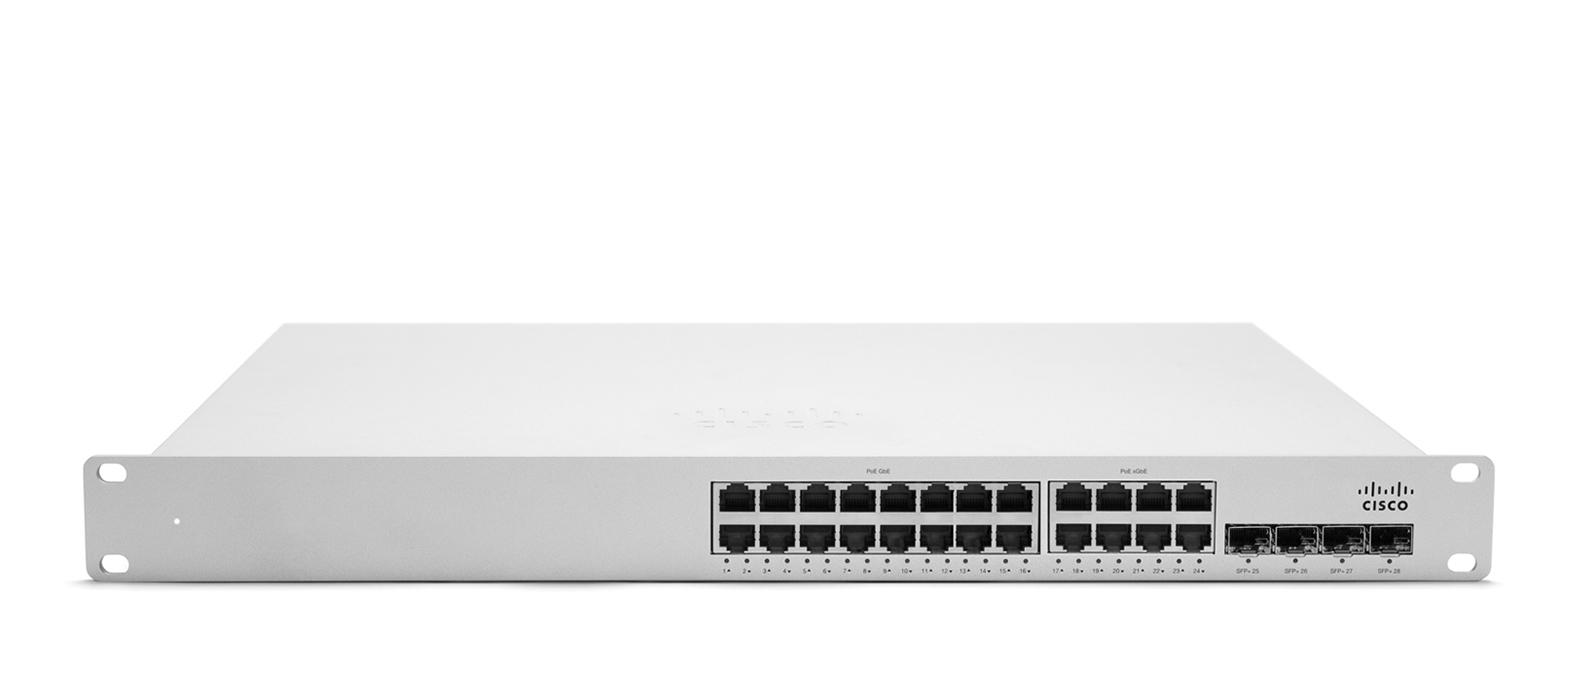 Cisco Meraki MS350-24X Gestionado L3 Gigabit Ethernet (10/100/1000) Blanco 1U Energía sobre Ethernet (PoE)